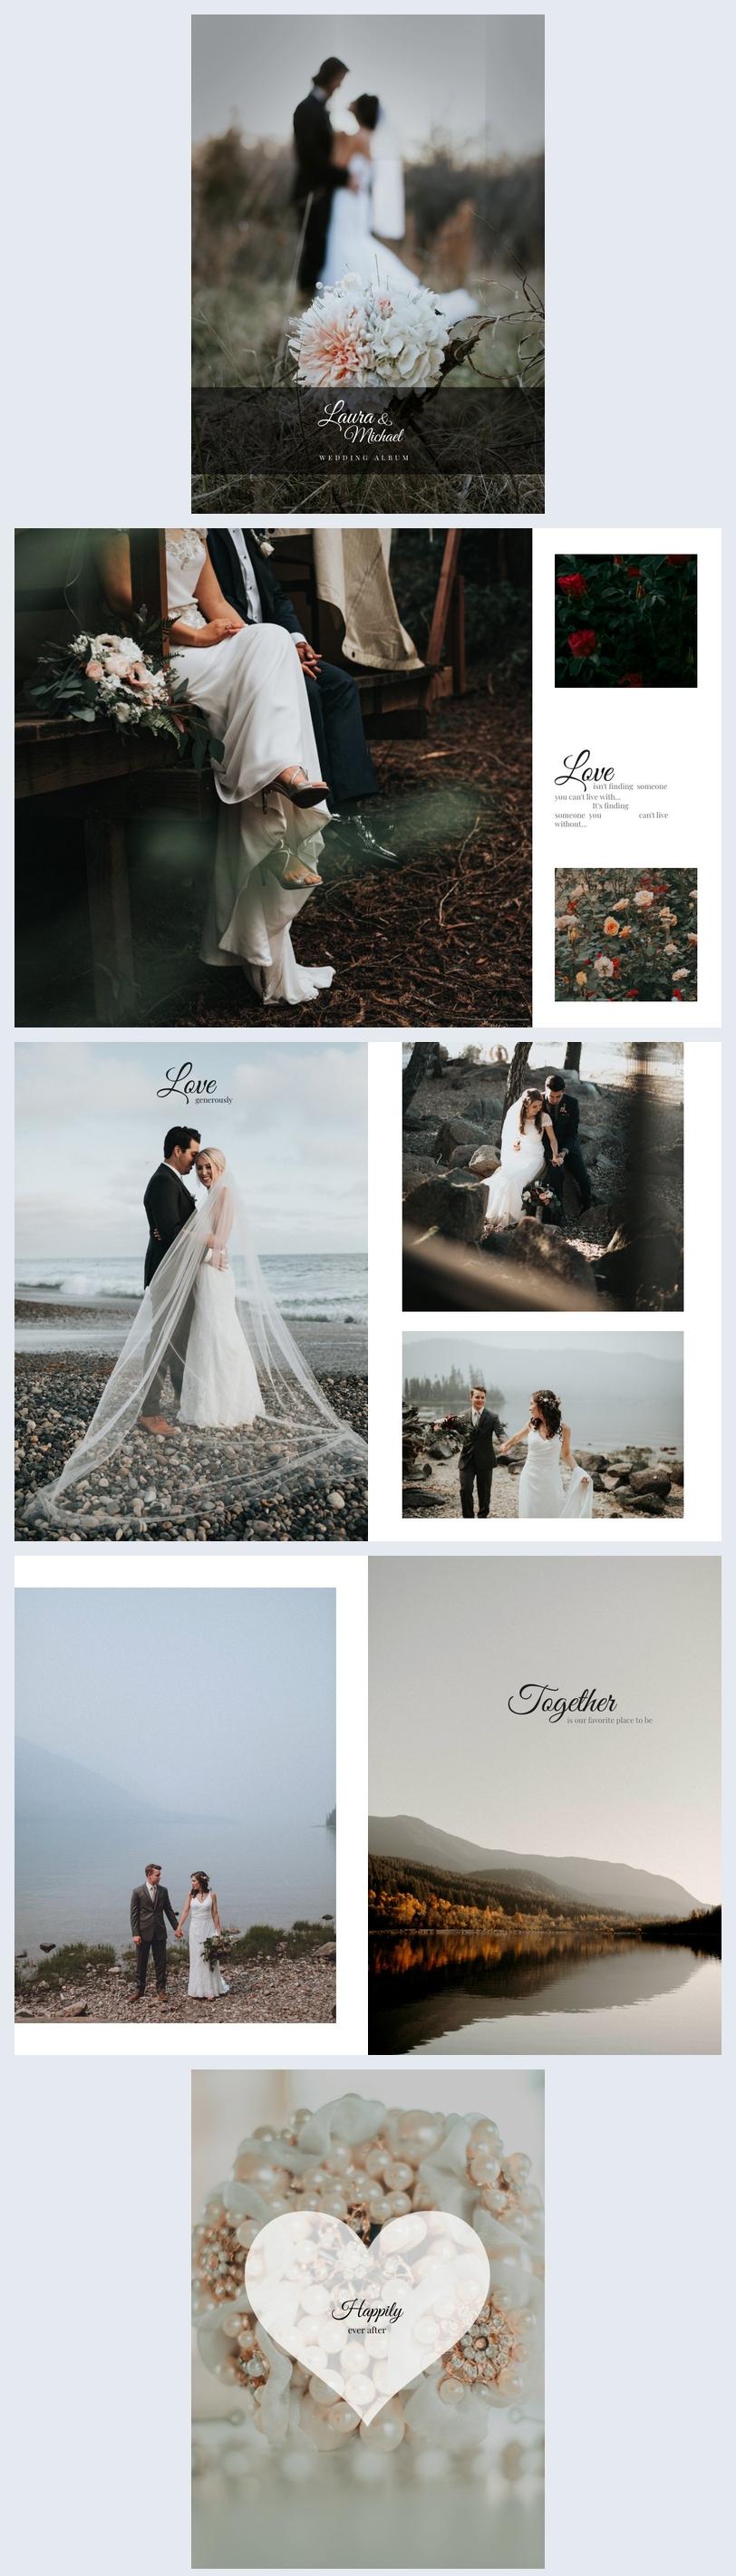 Minimalistic Wedding Photo Book Template